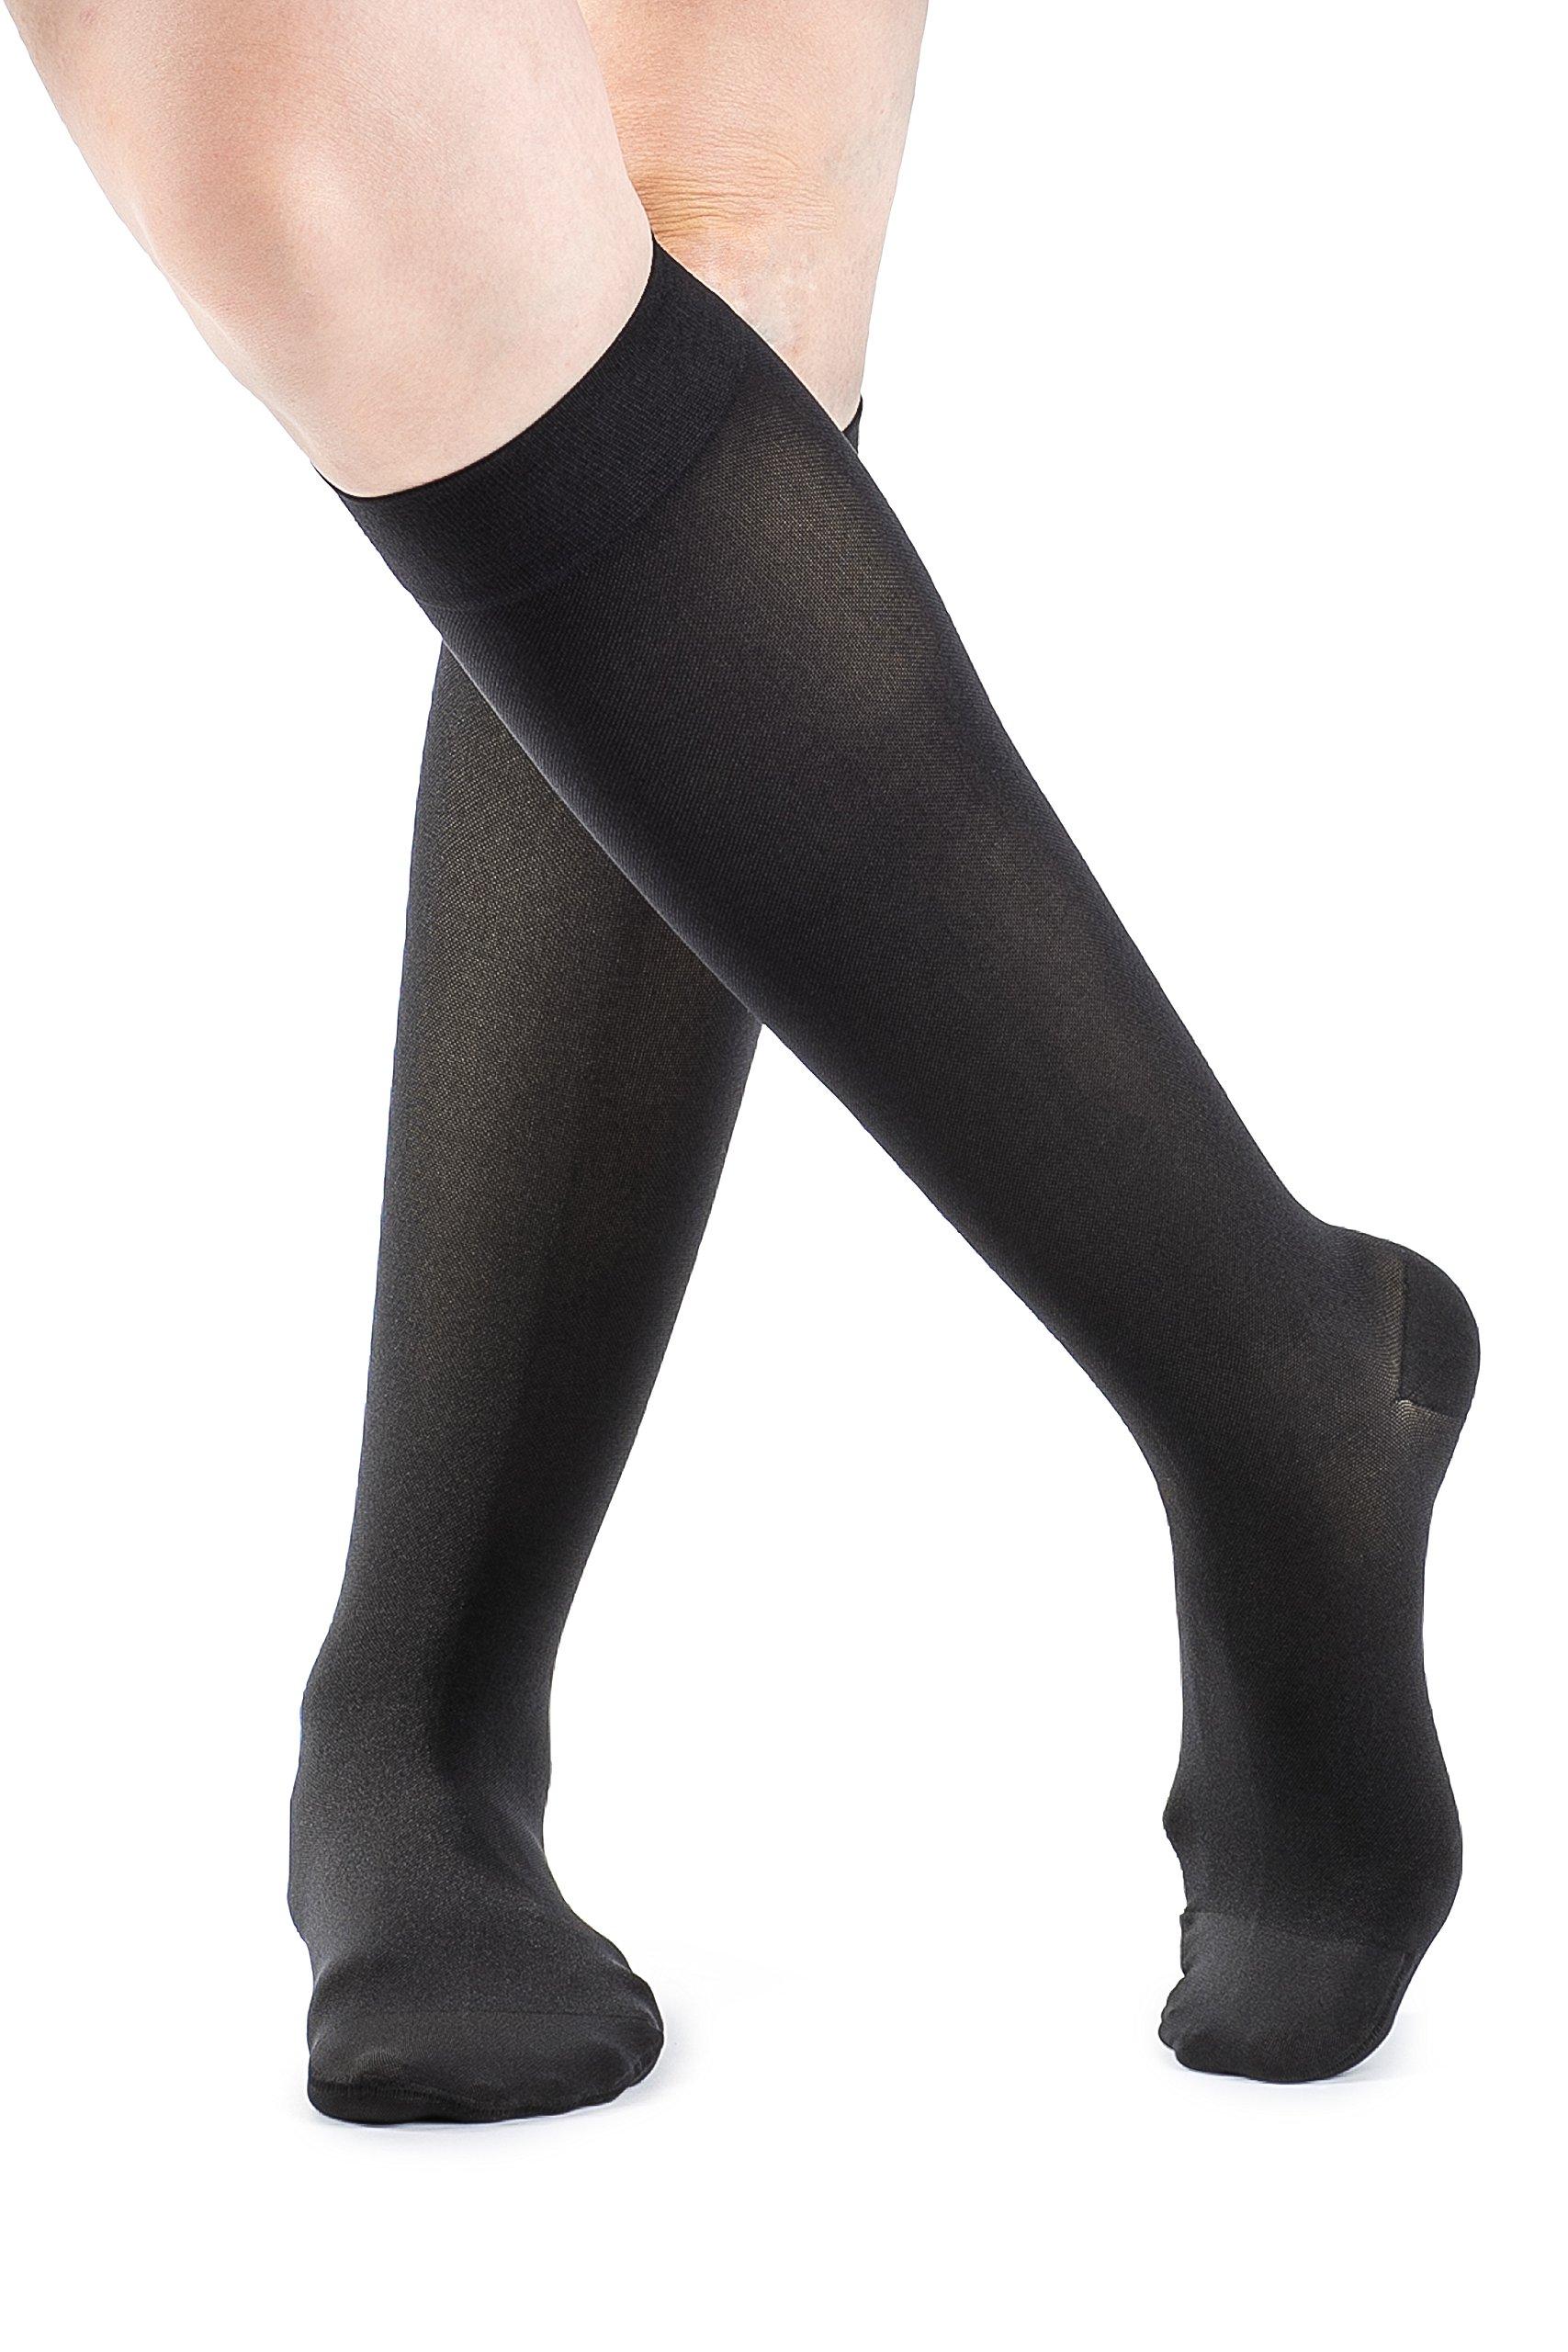 4e9a51fbb61 SIGVARIS SOFT OPAQUE 840 Women s Closed Toe Calf Compression Socks 15-20mmHg